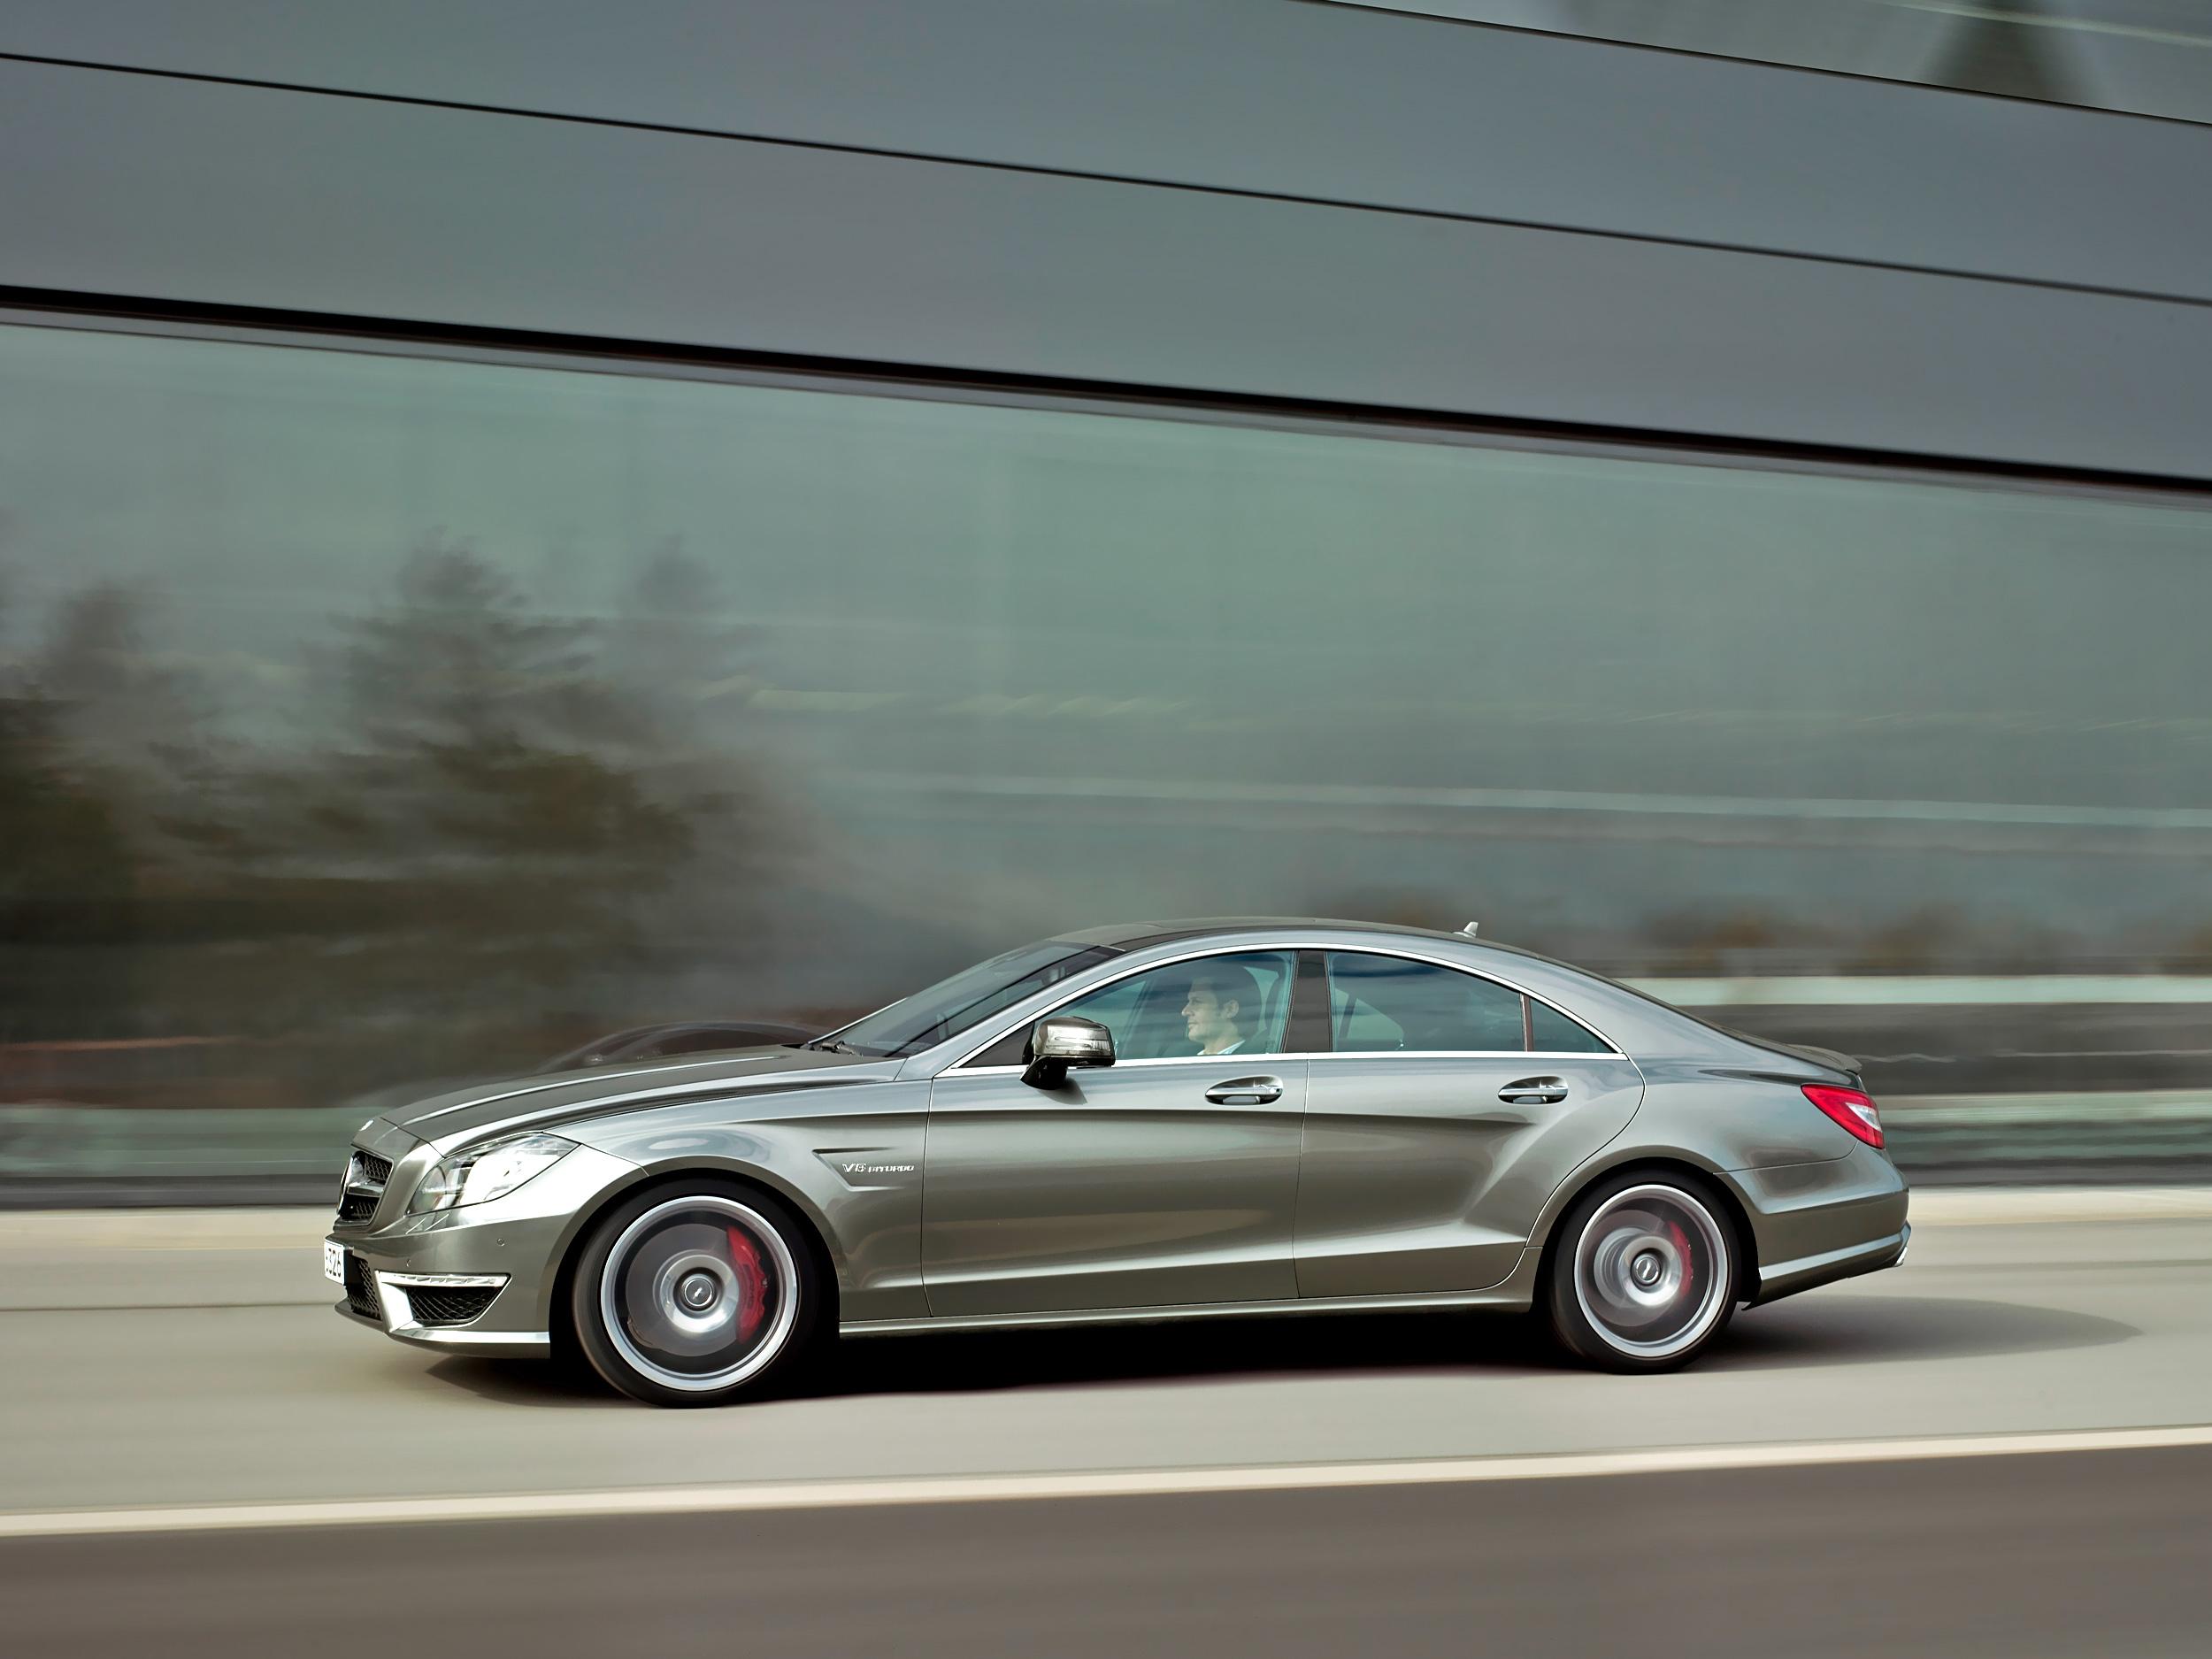 Mercedes benz cls 63 amg 2011 2500x1875 for 2011 mercedes benz cls63 amg